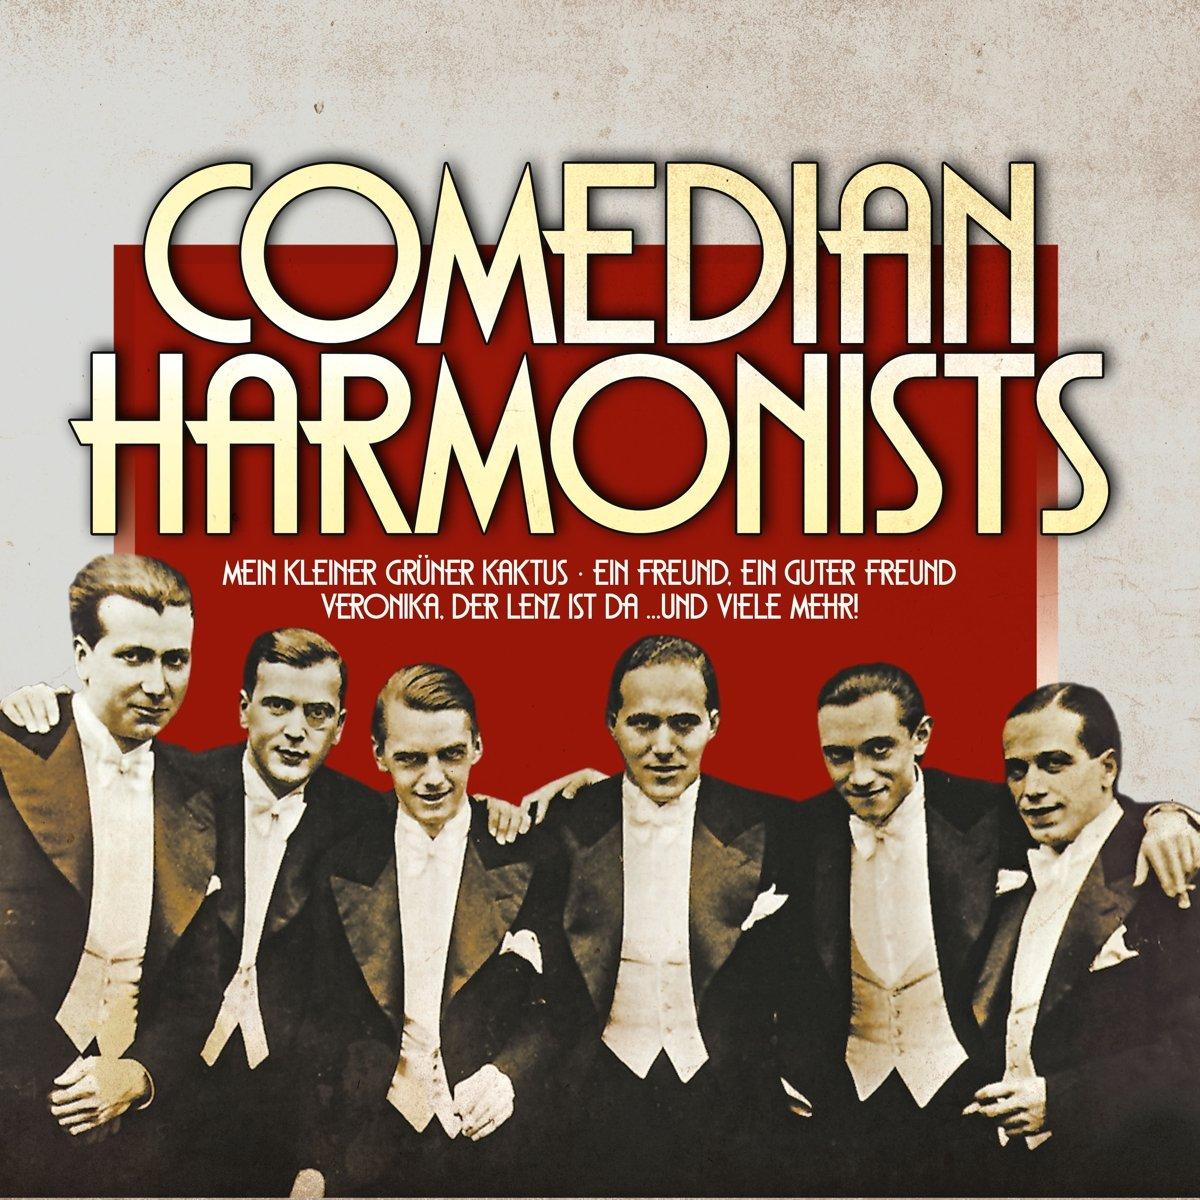 Vinilo : Comedian Harmonists - Comedian Harmonists (LP Vinyl)